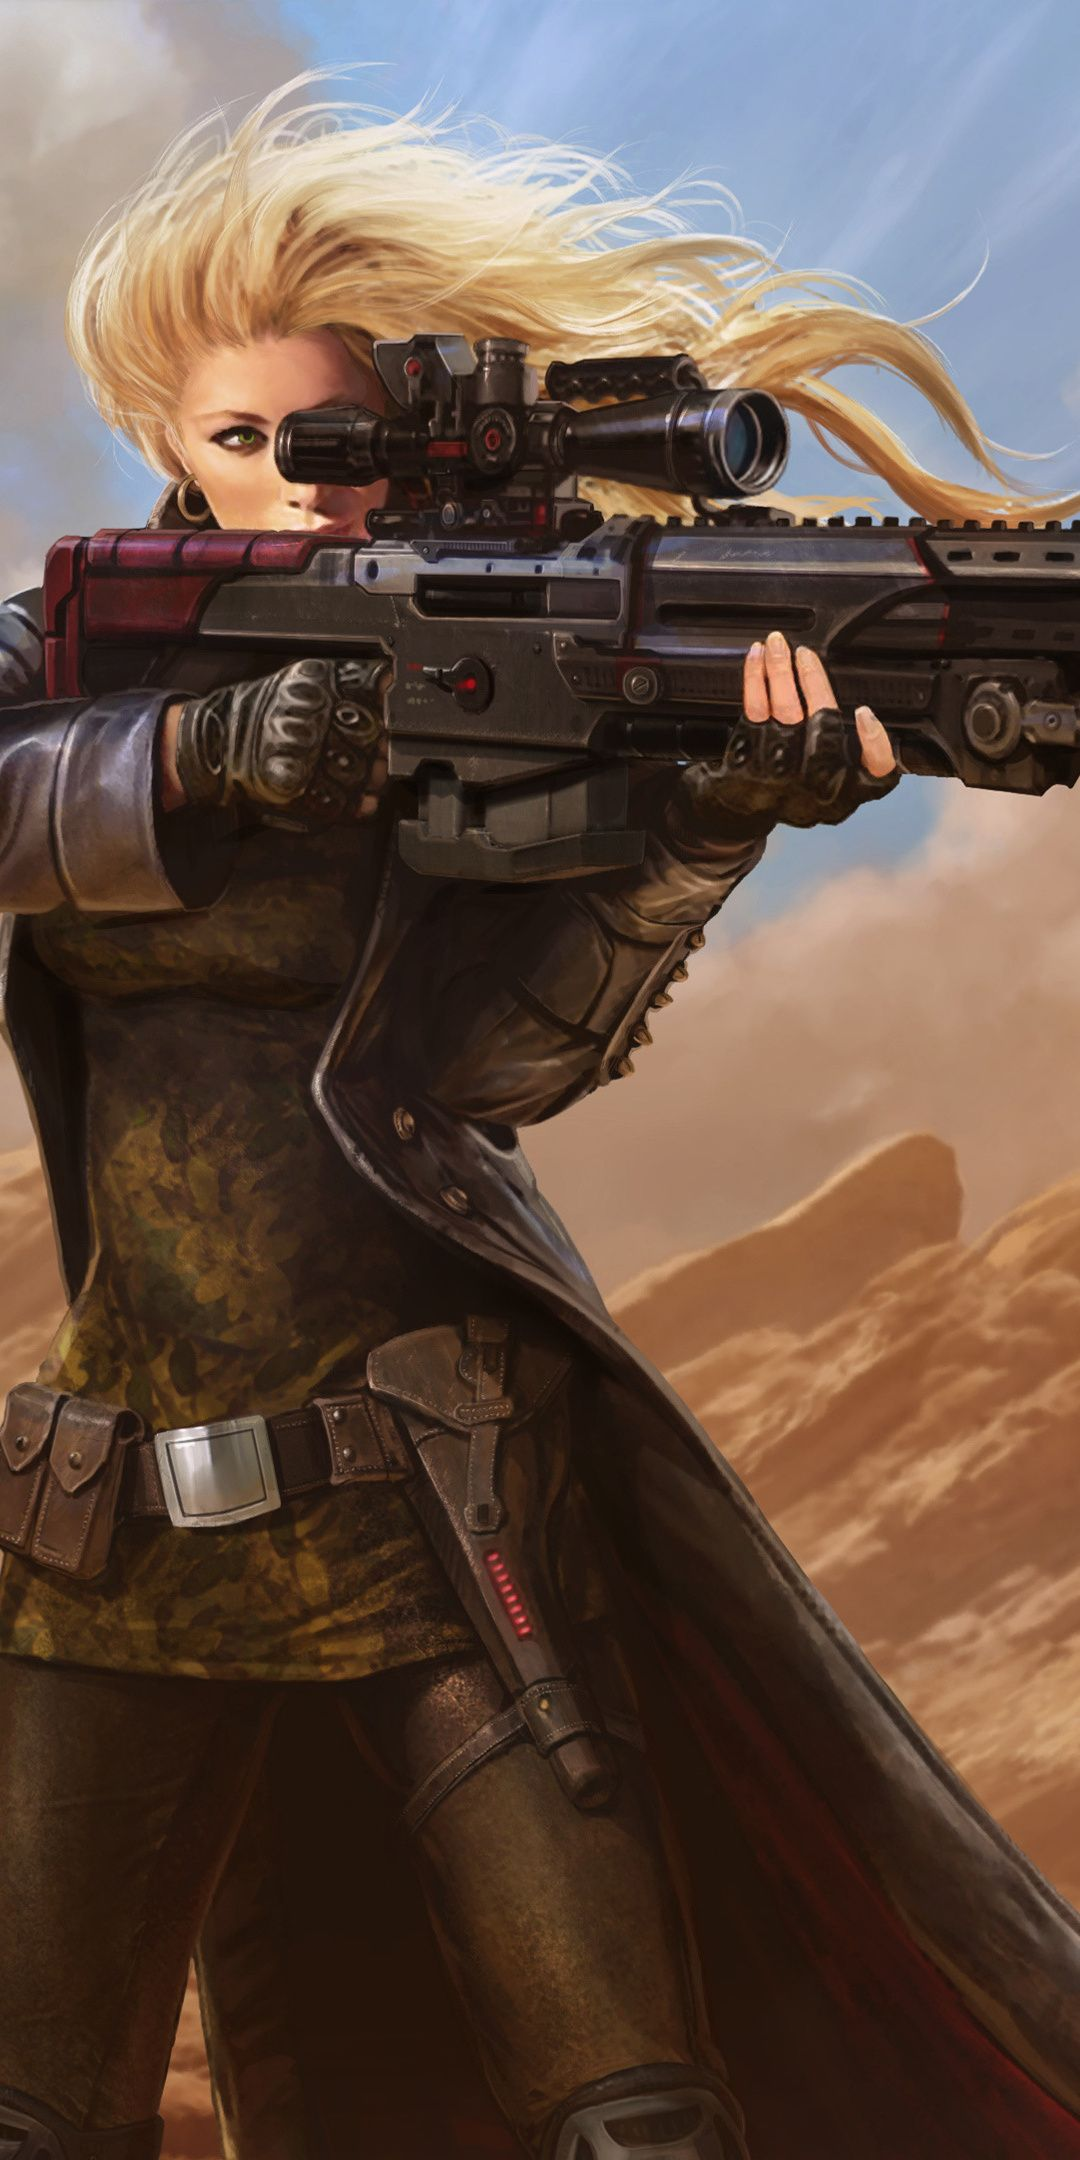 Juggernaut Wars Sniper Girl Artwork 1080x2160 Wallpaper Sniper Girl Digital Art Girl Wallpaper